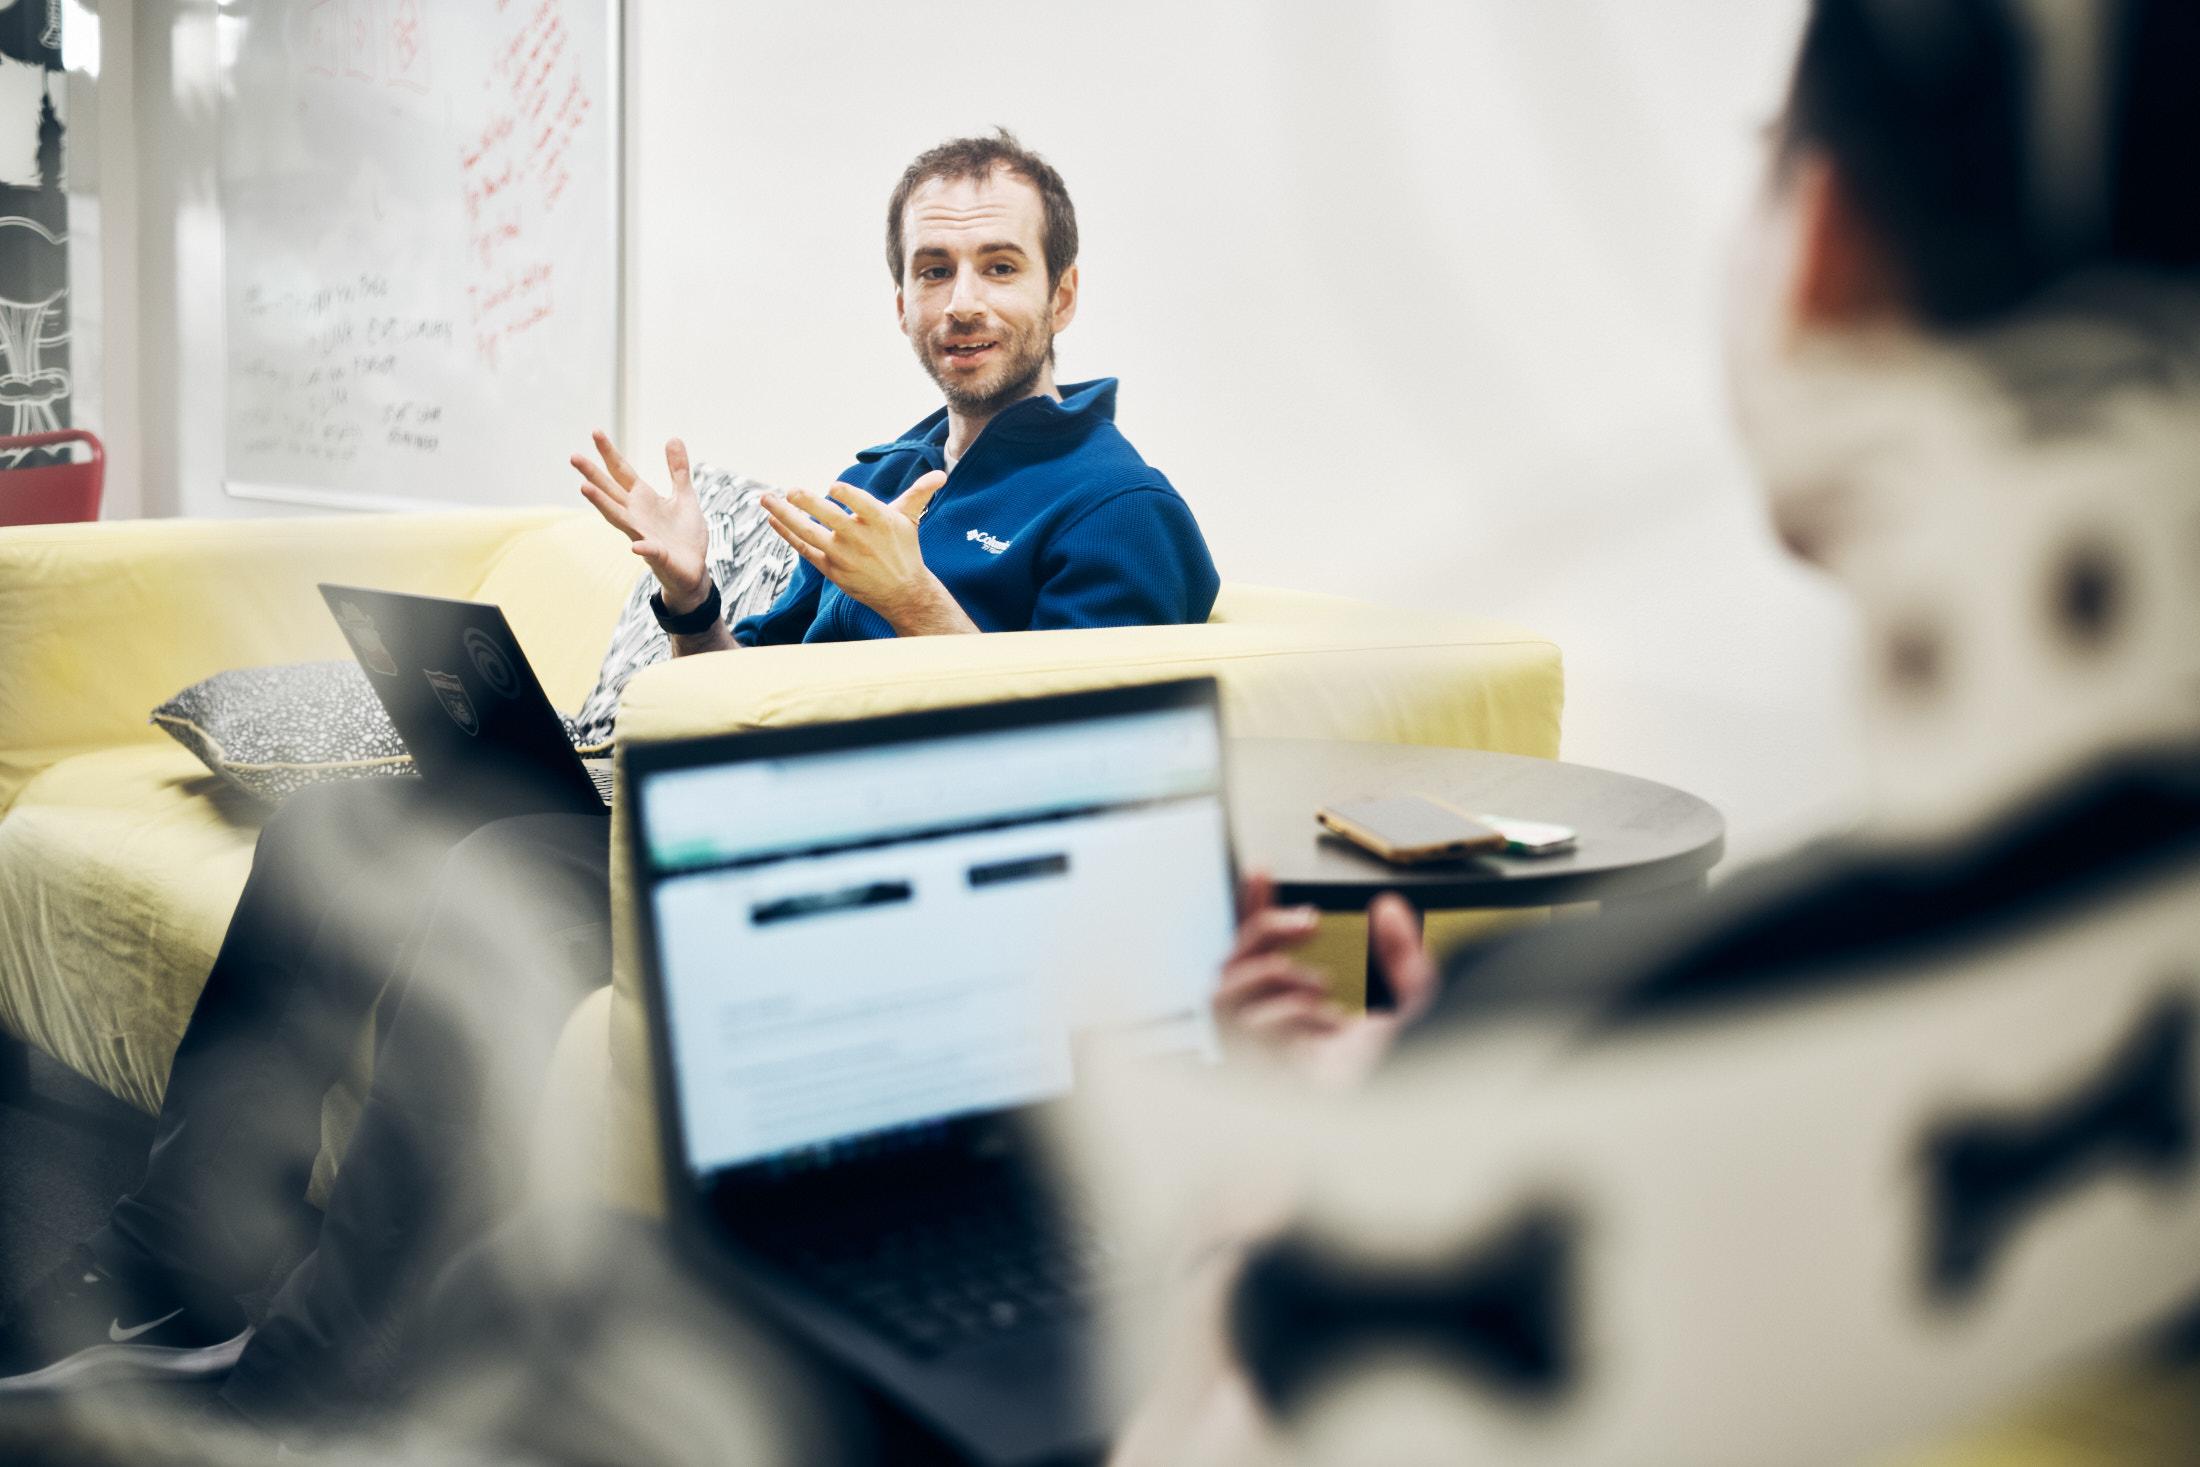 Producer Hami Arabestani having a meeting